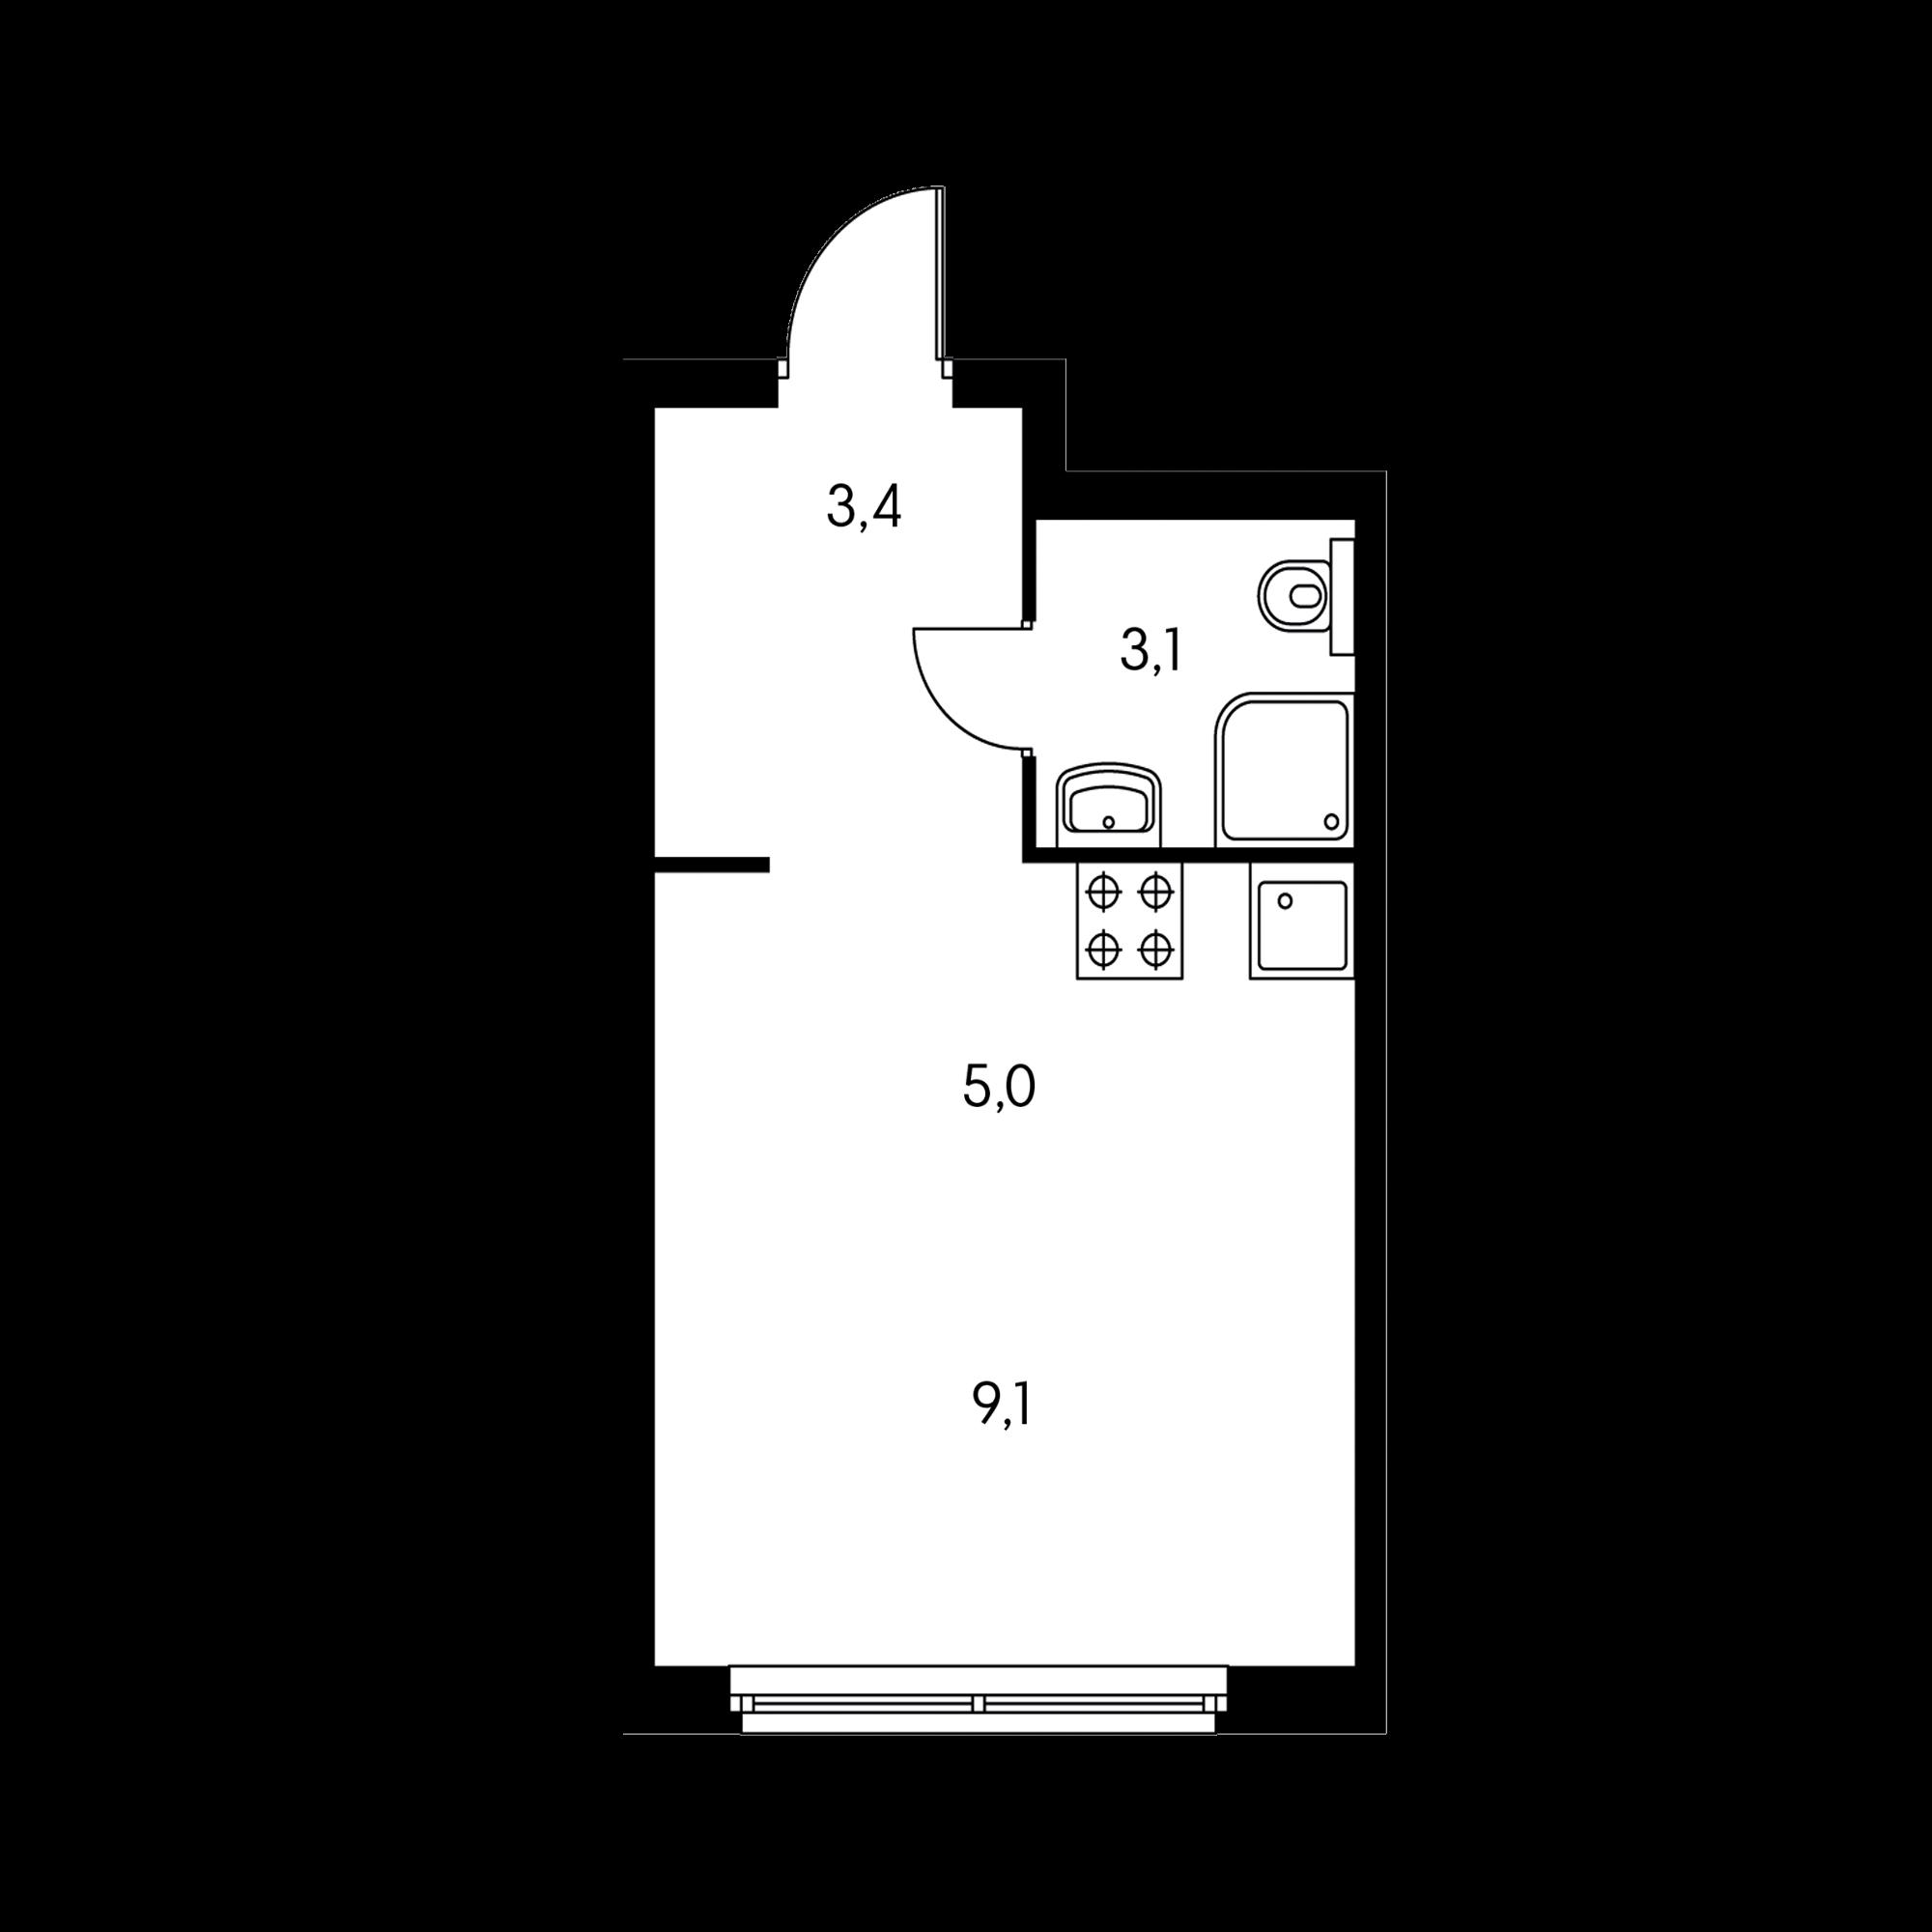 1NS1-1